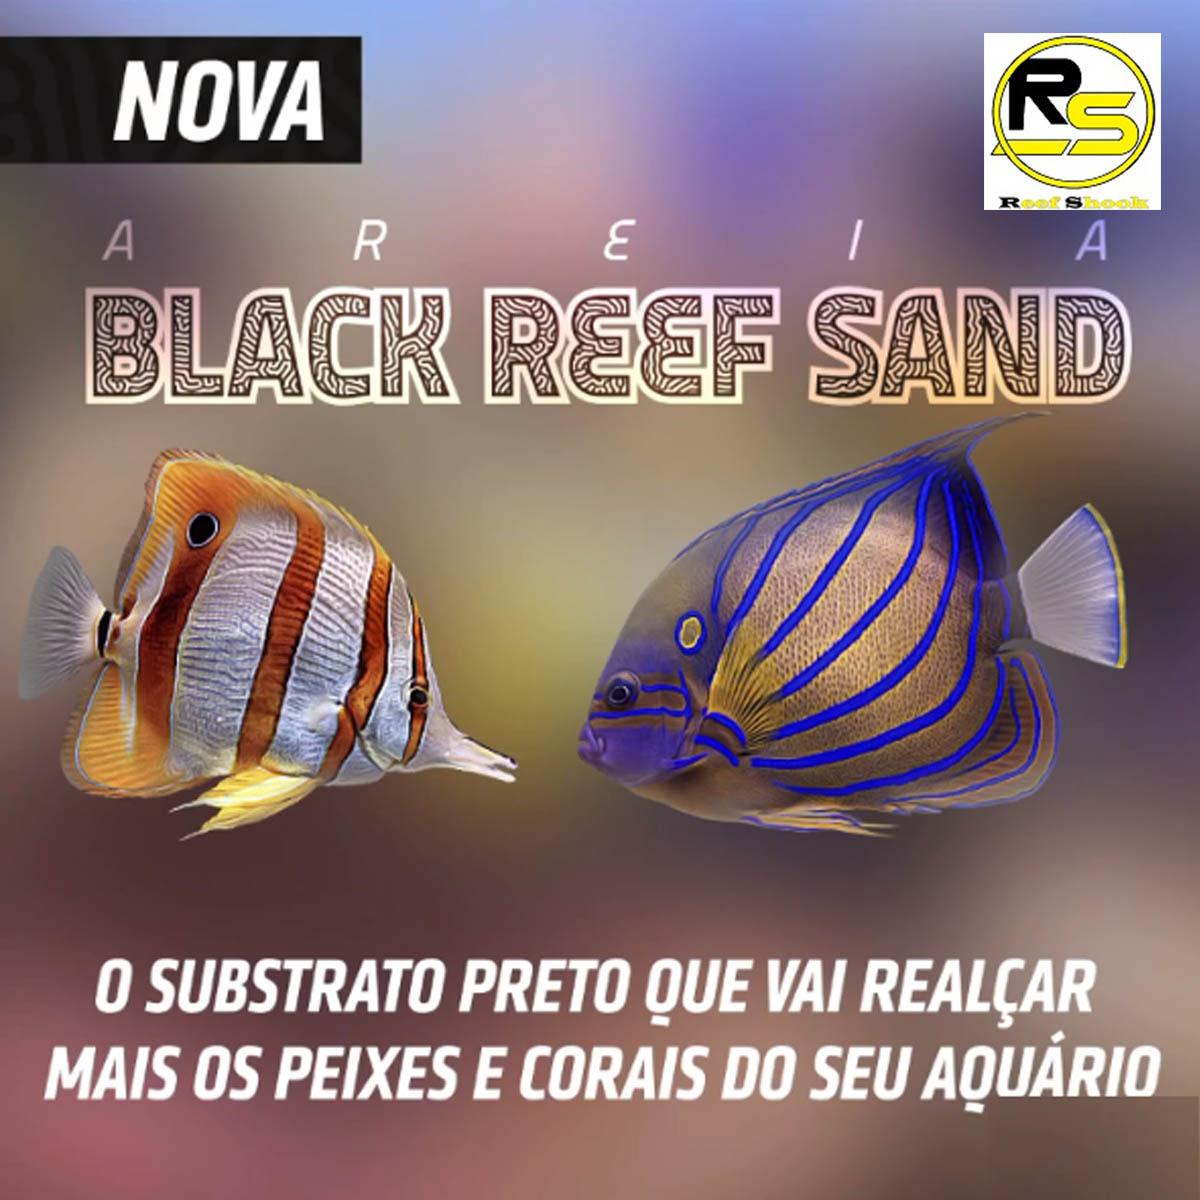 Substrato Mbreda Black Reef Sand Marinho Pote 6kg